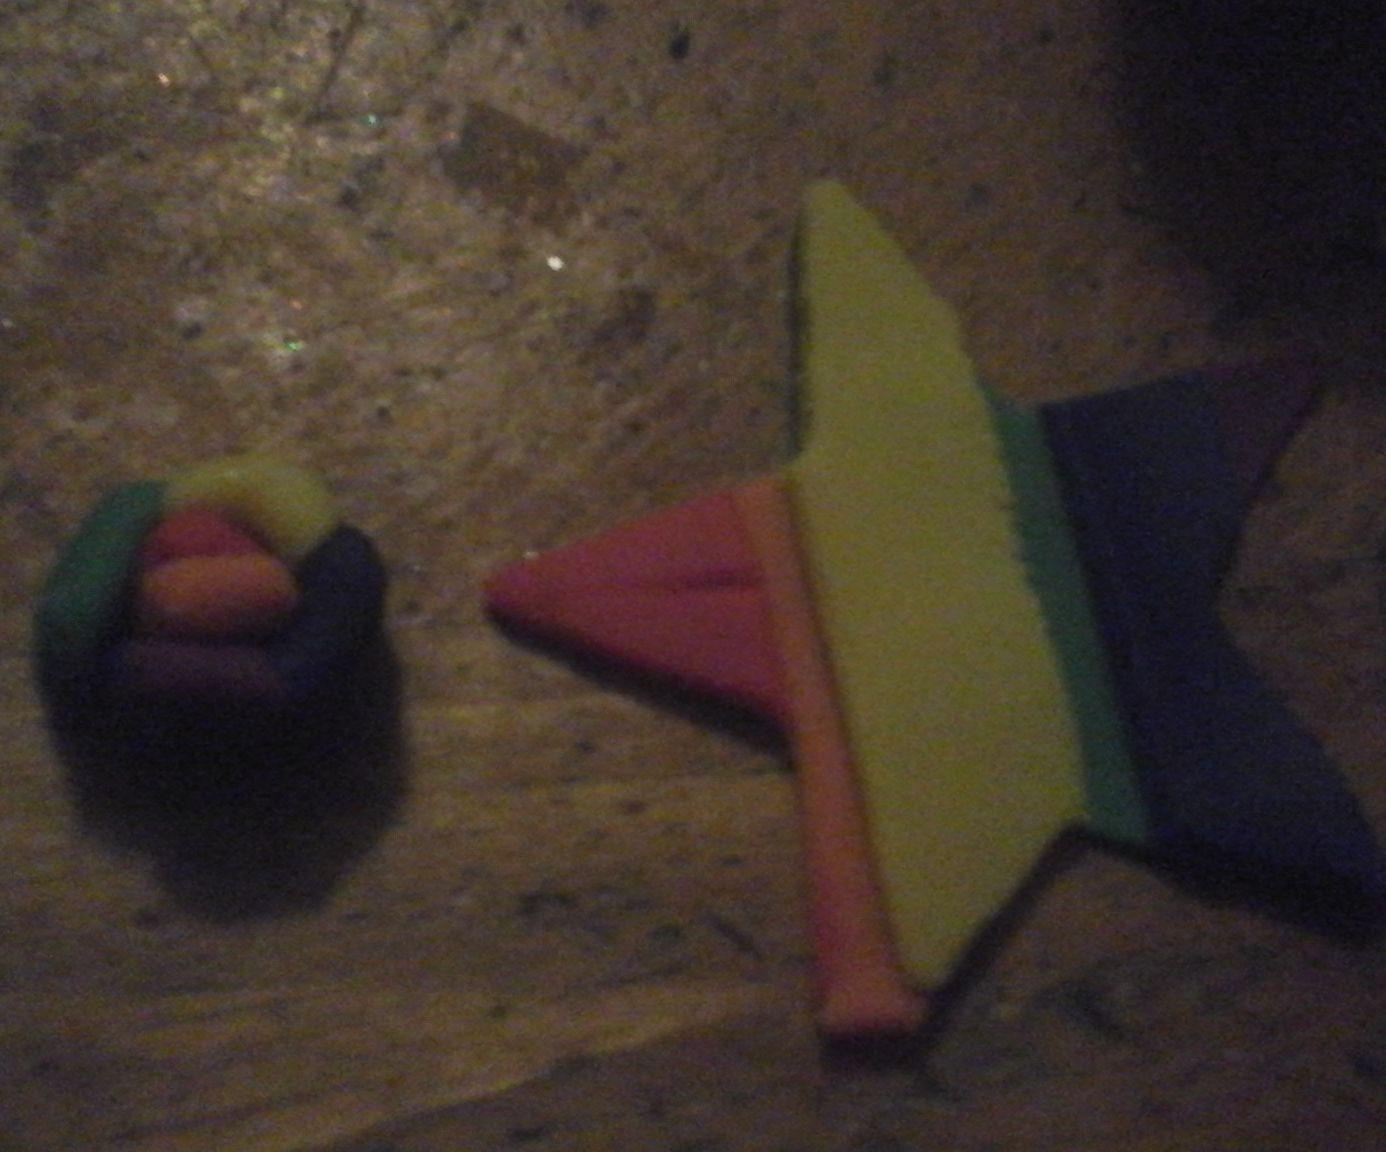 Rainbow play-doh spirals and stars